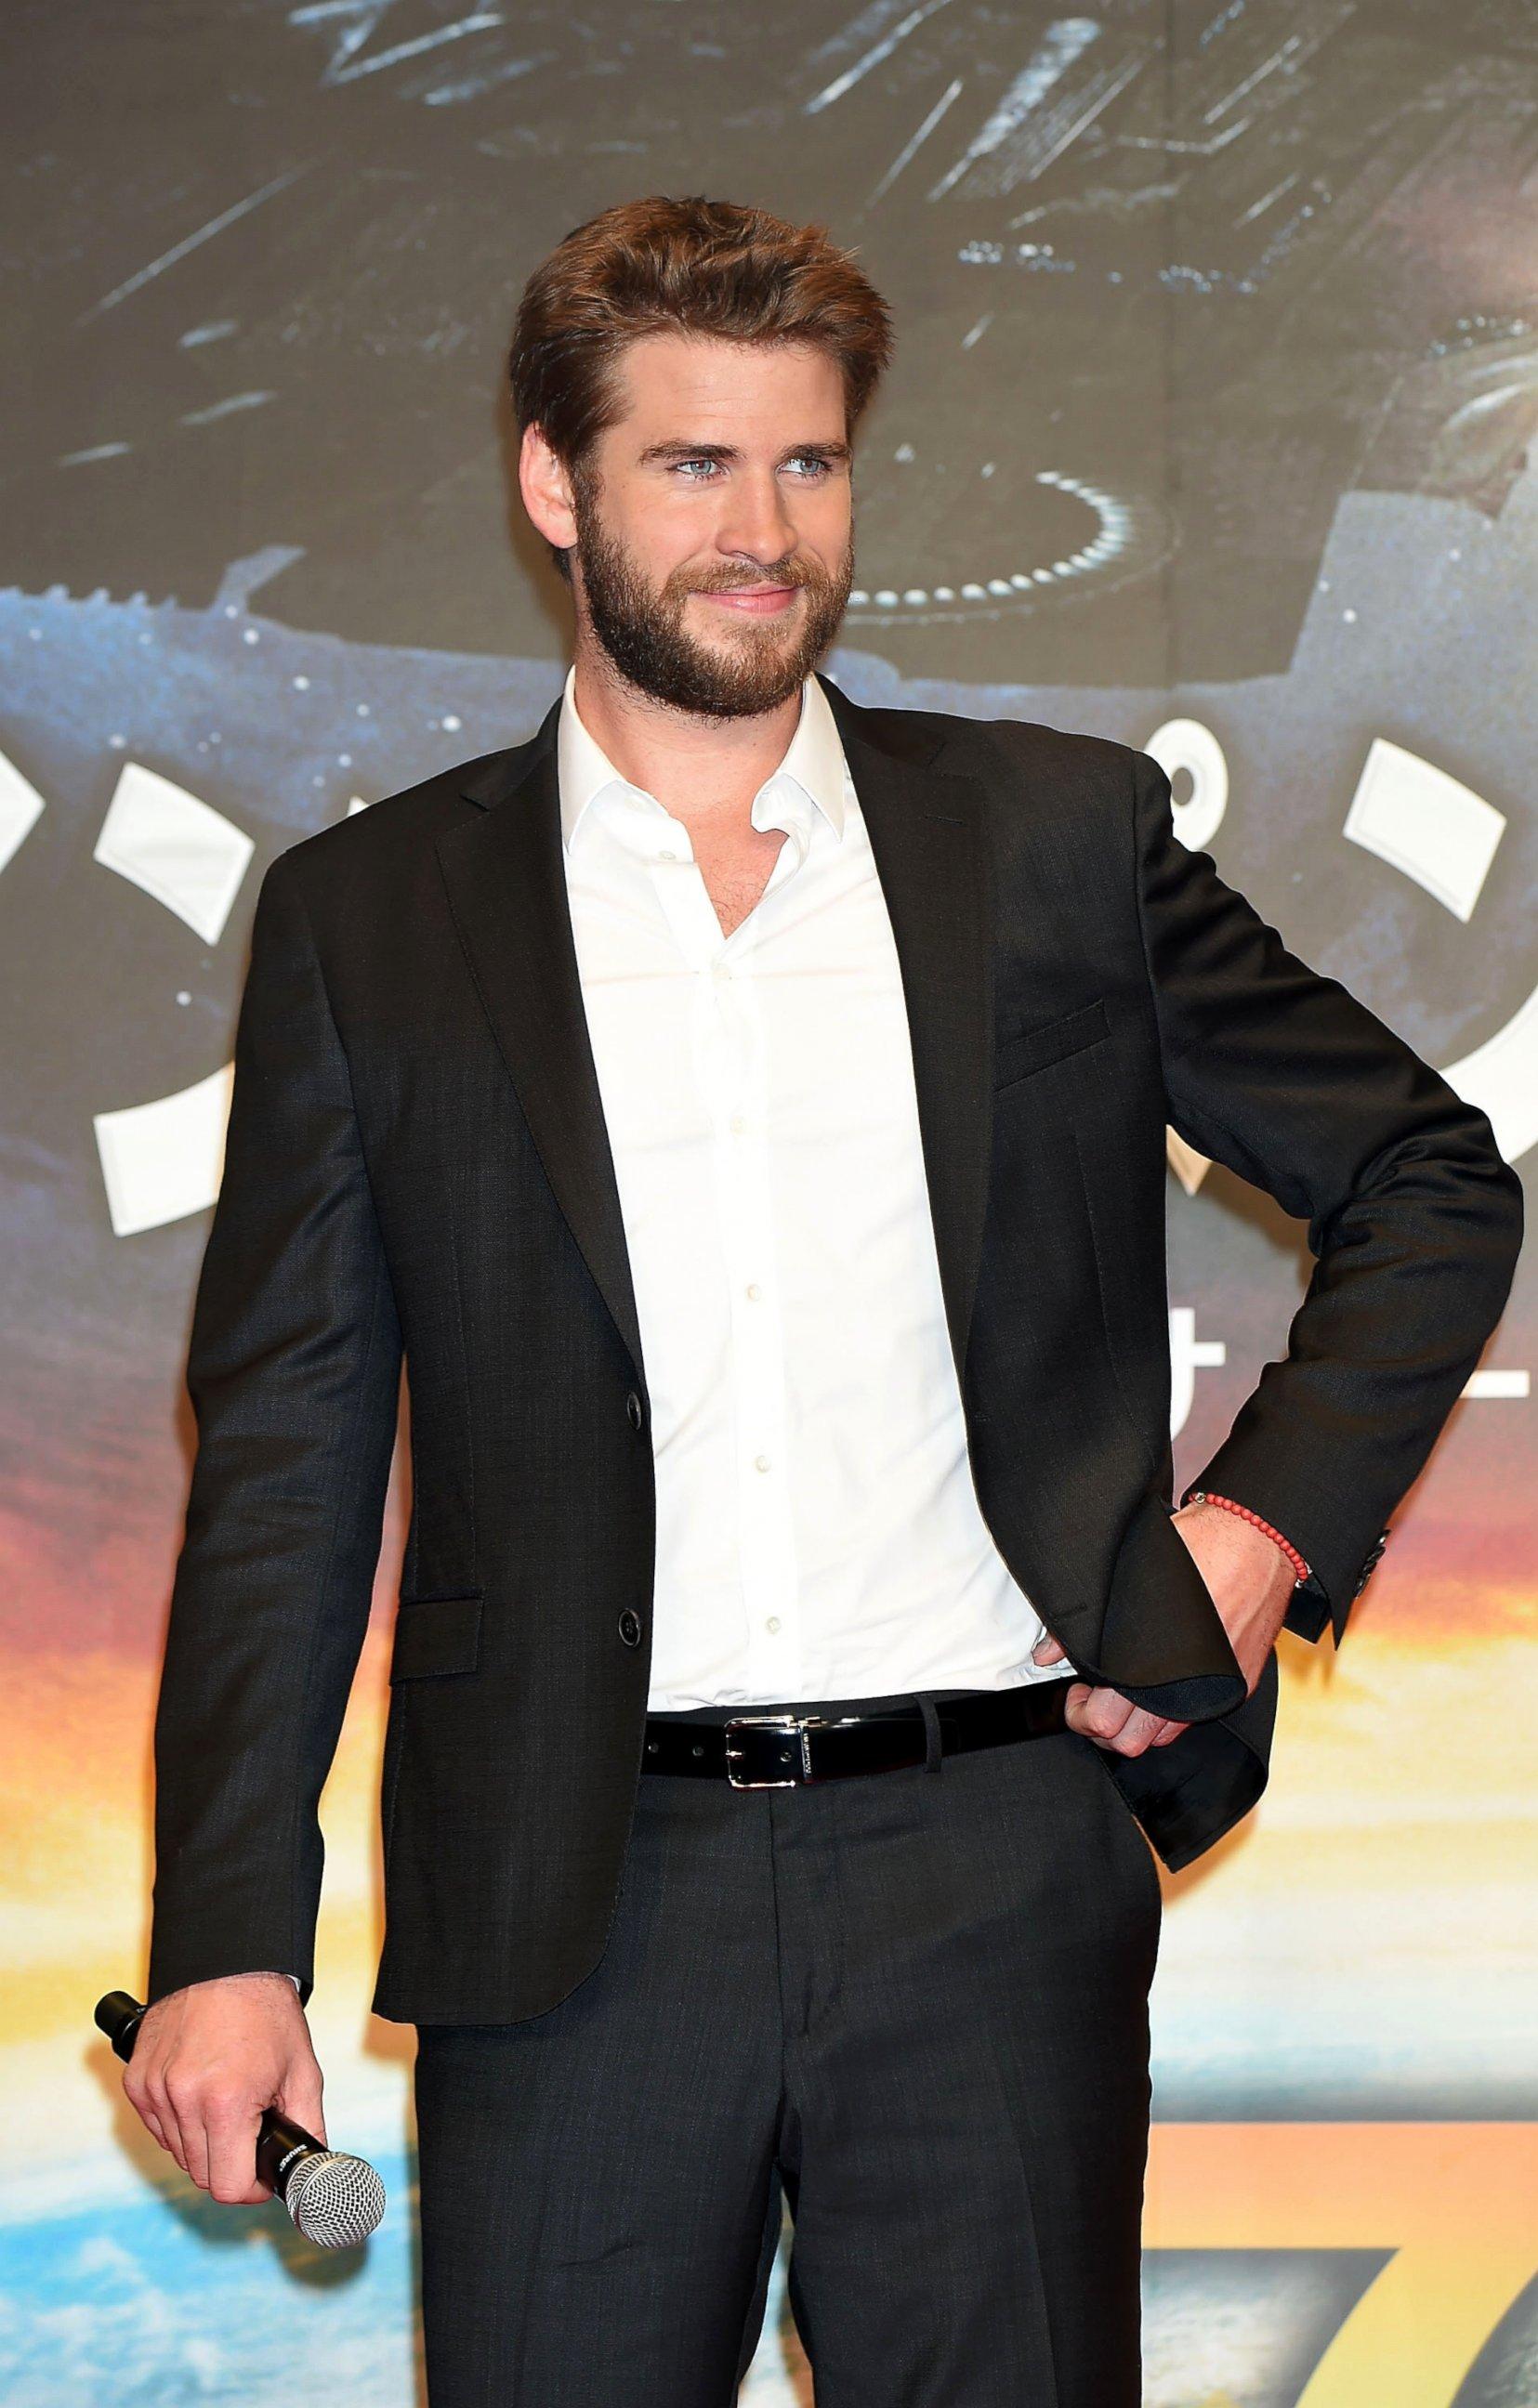 Liam Hemsworth 2018 worth – CountryBaptist